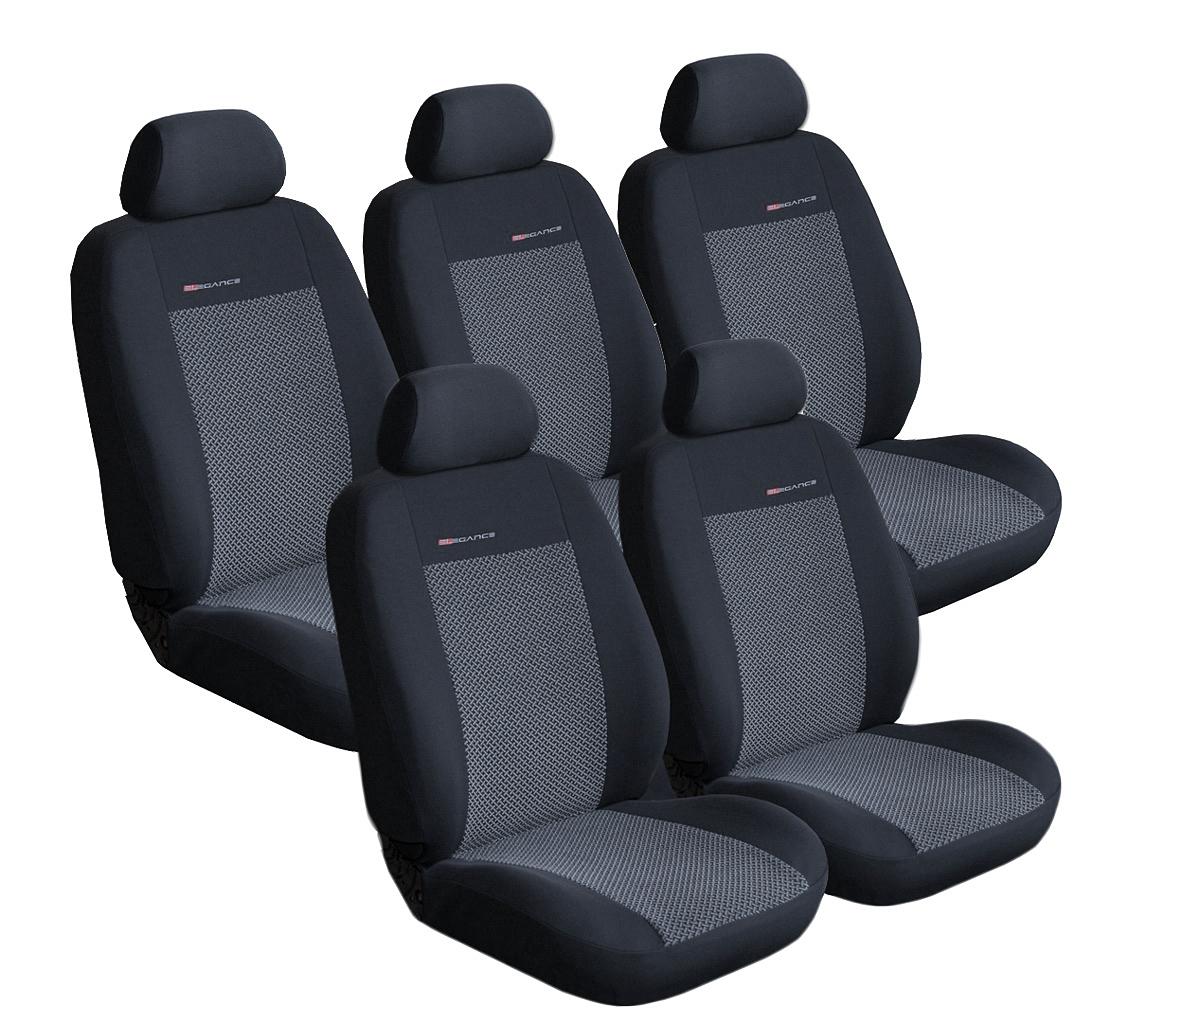 SKODA ROOMSTER 5 Seats